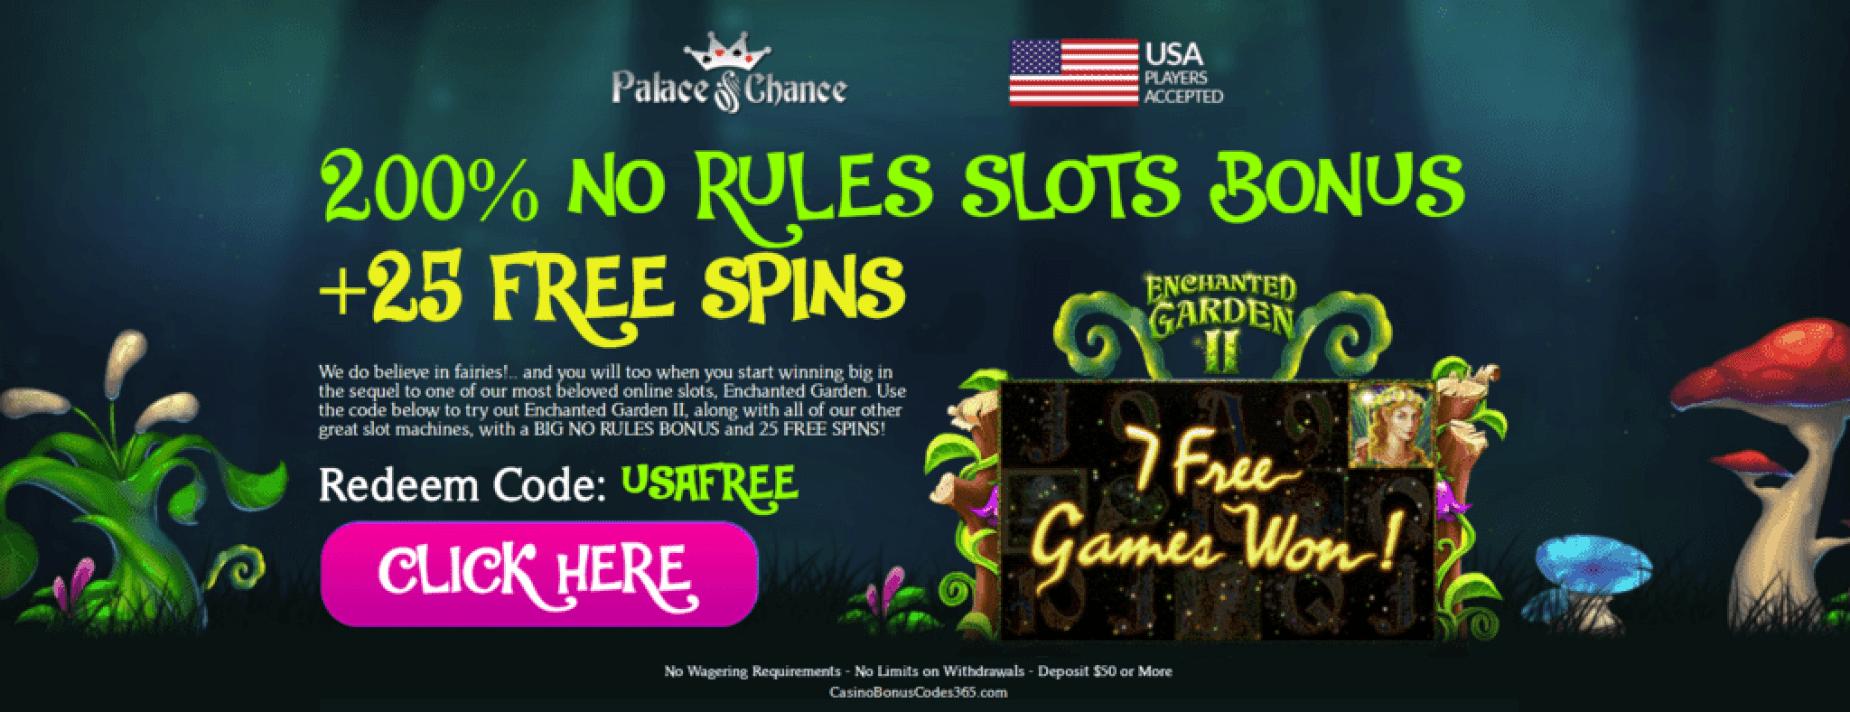 Palace of Chance Online Casino 200% No Rules Slot Bonus Plus 25 FREE Spins